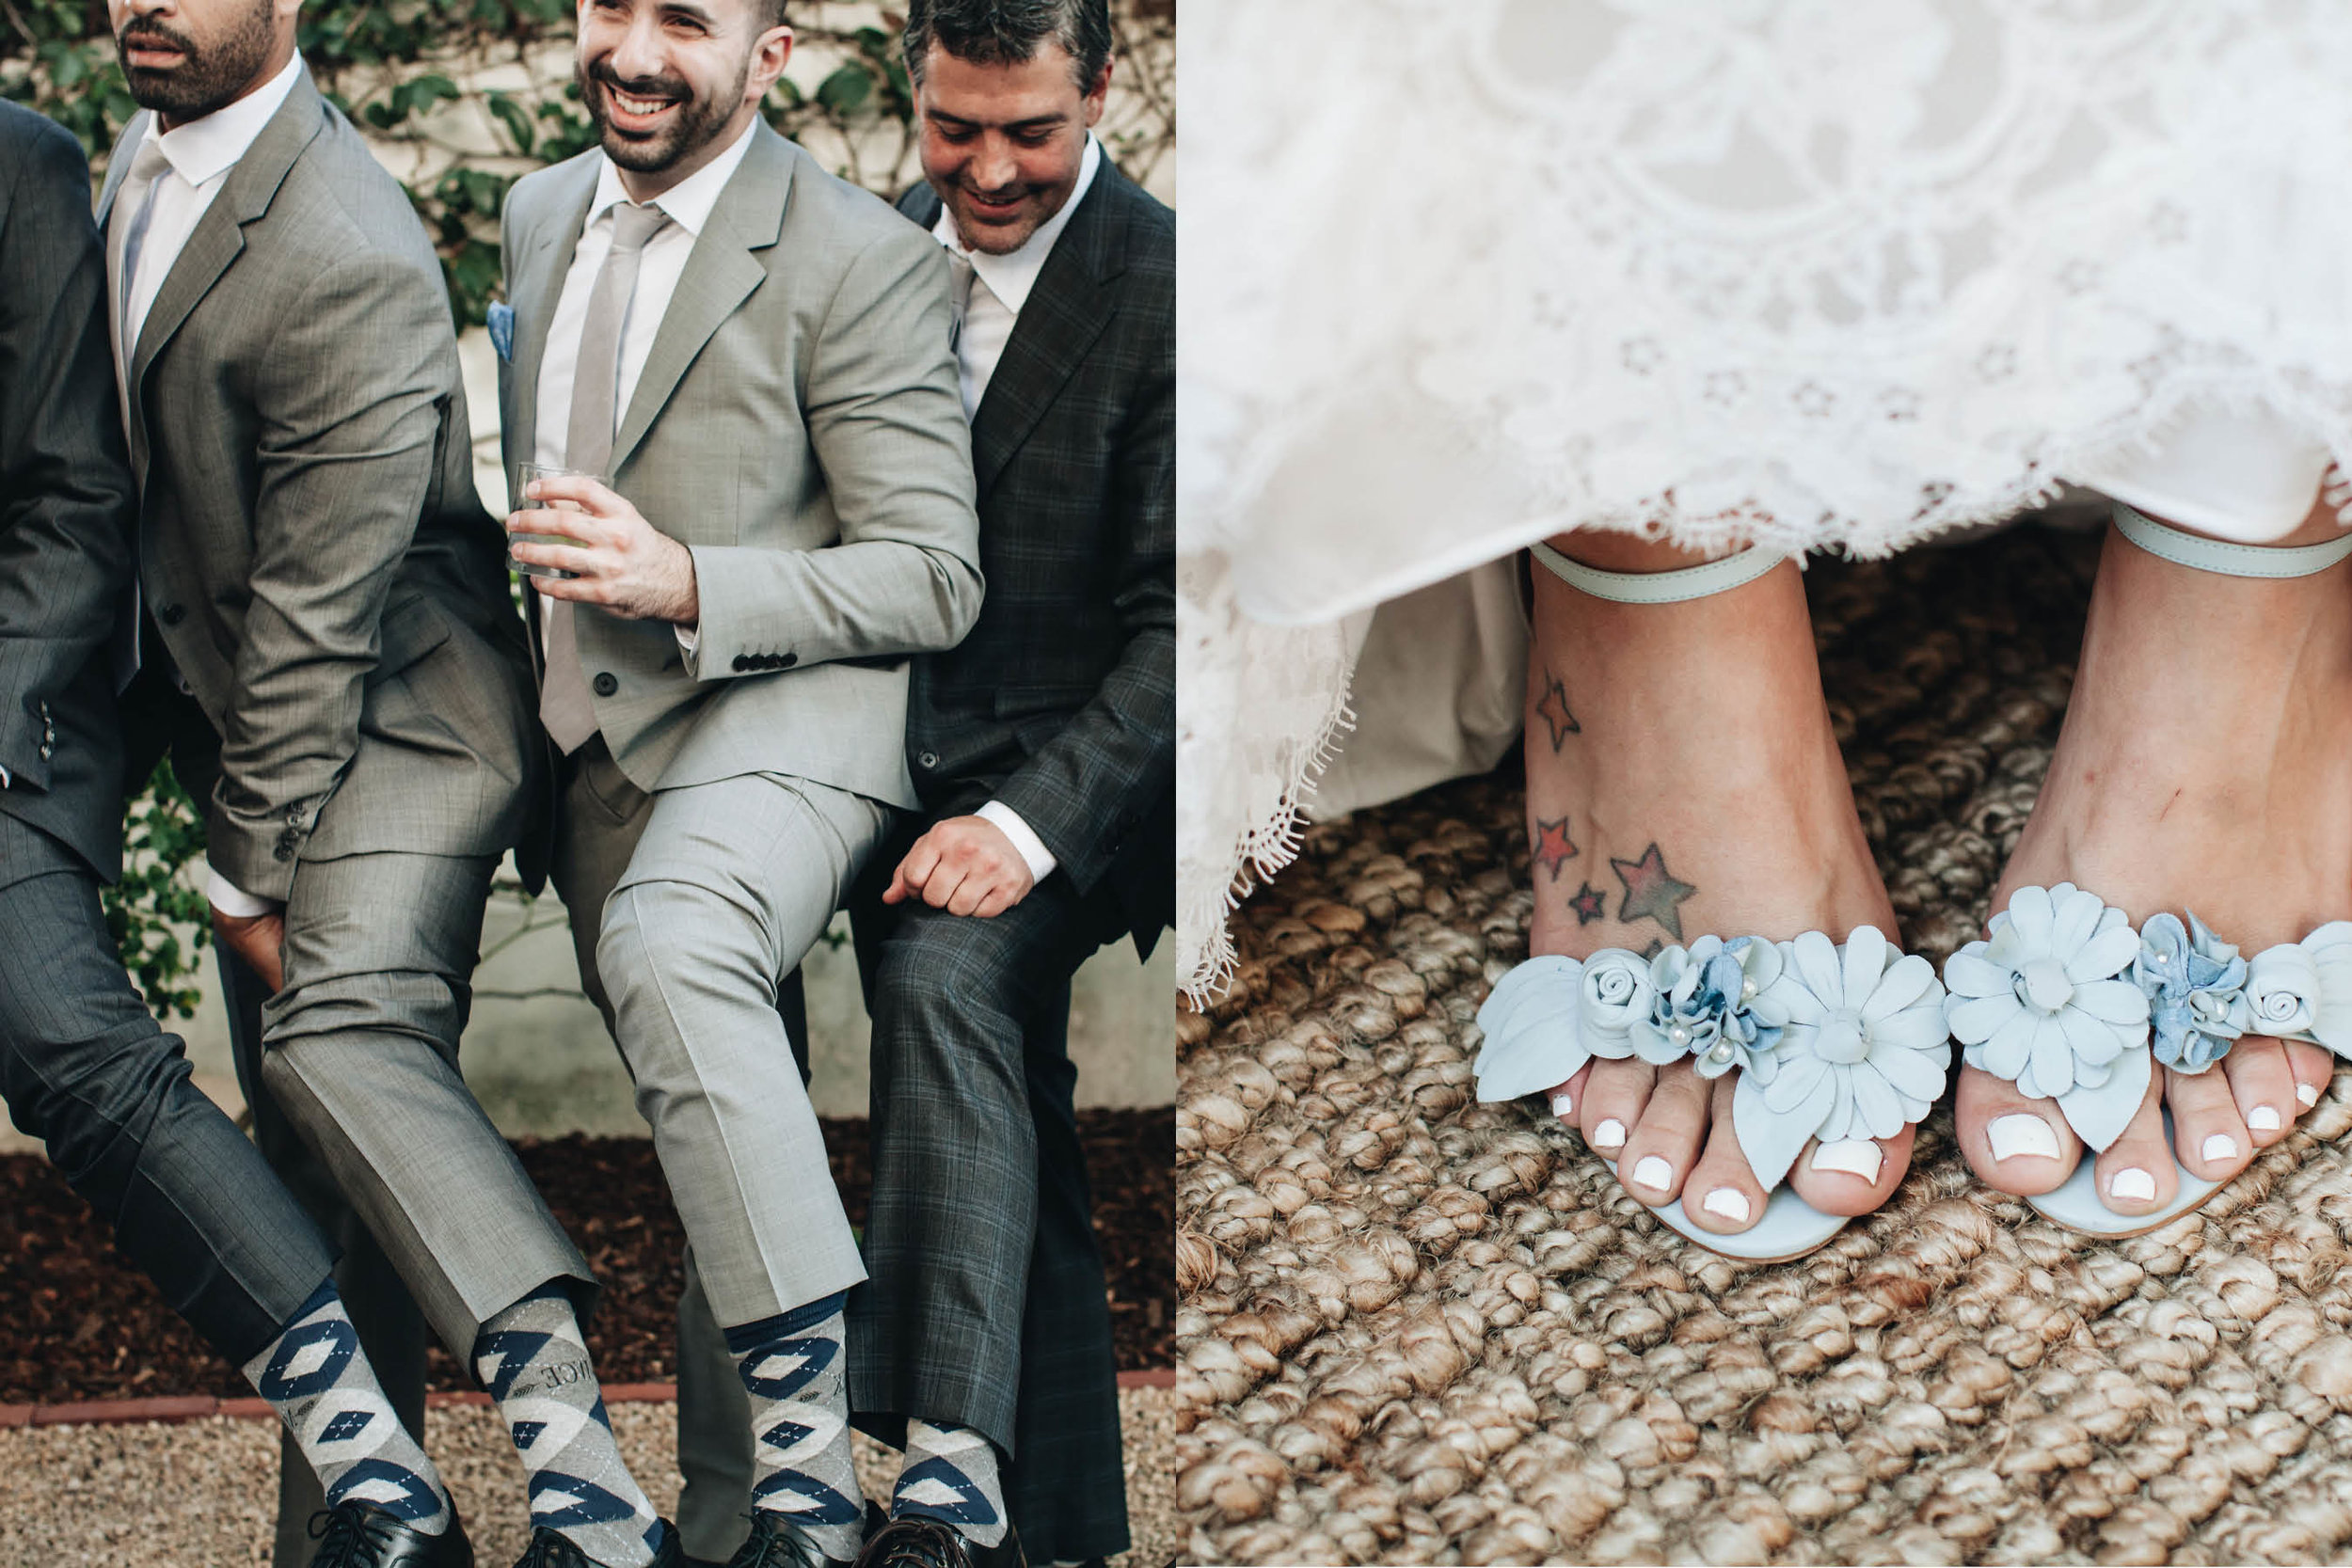 santa-barbara-elopement-wedding-planner-planning-coordination-day-of-coordinator-downtown-garden-oasis-float-spa-fountain-blue-white-event-design-vintage-china (31).jpg